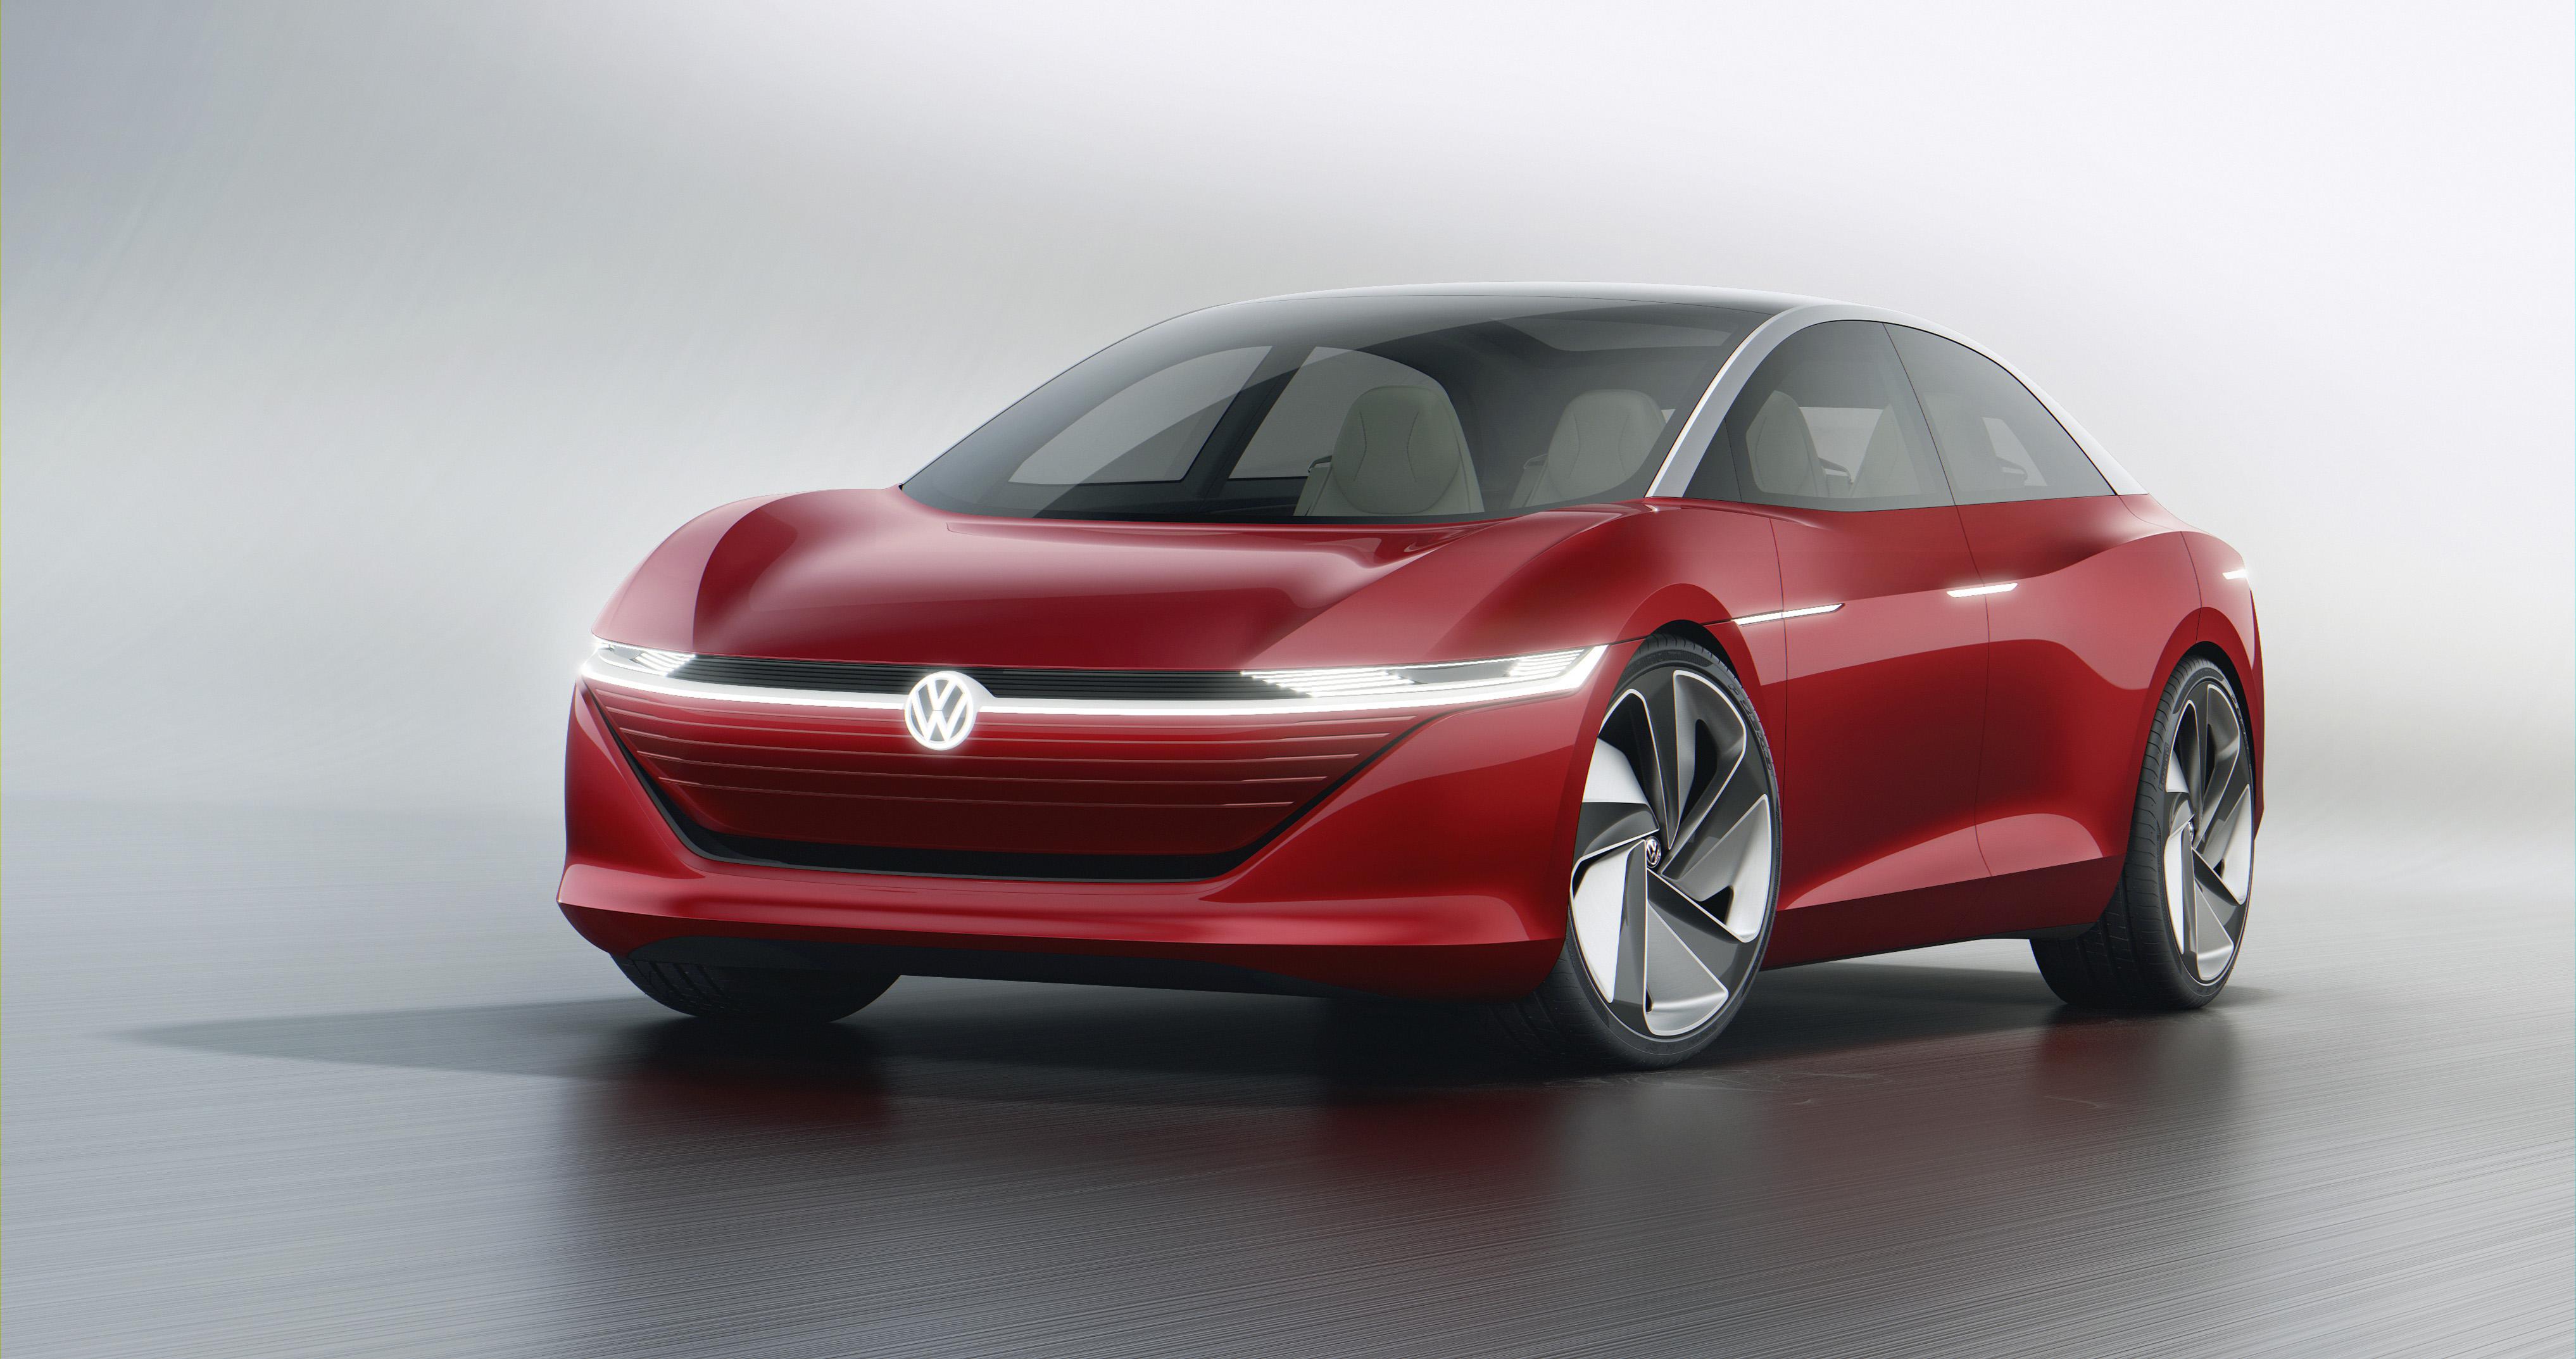 2018 Volkswagen I.D. Vizzion concept.